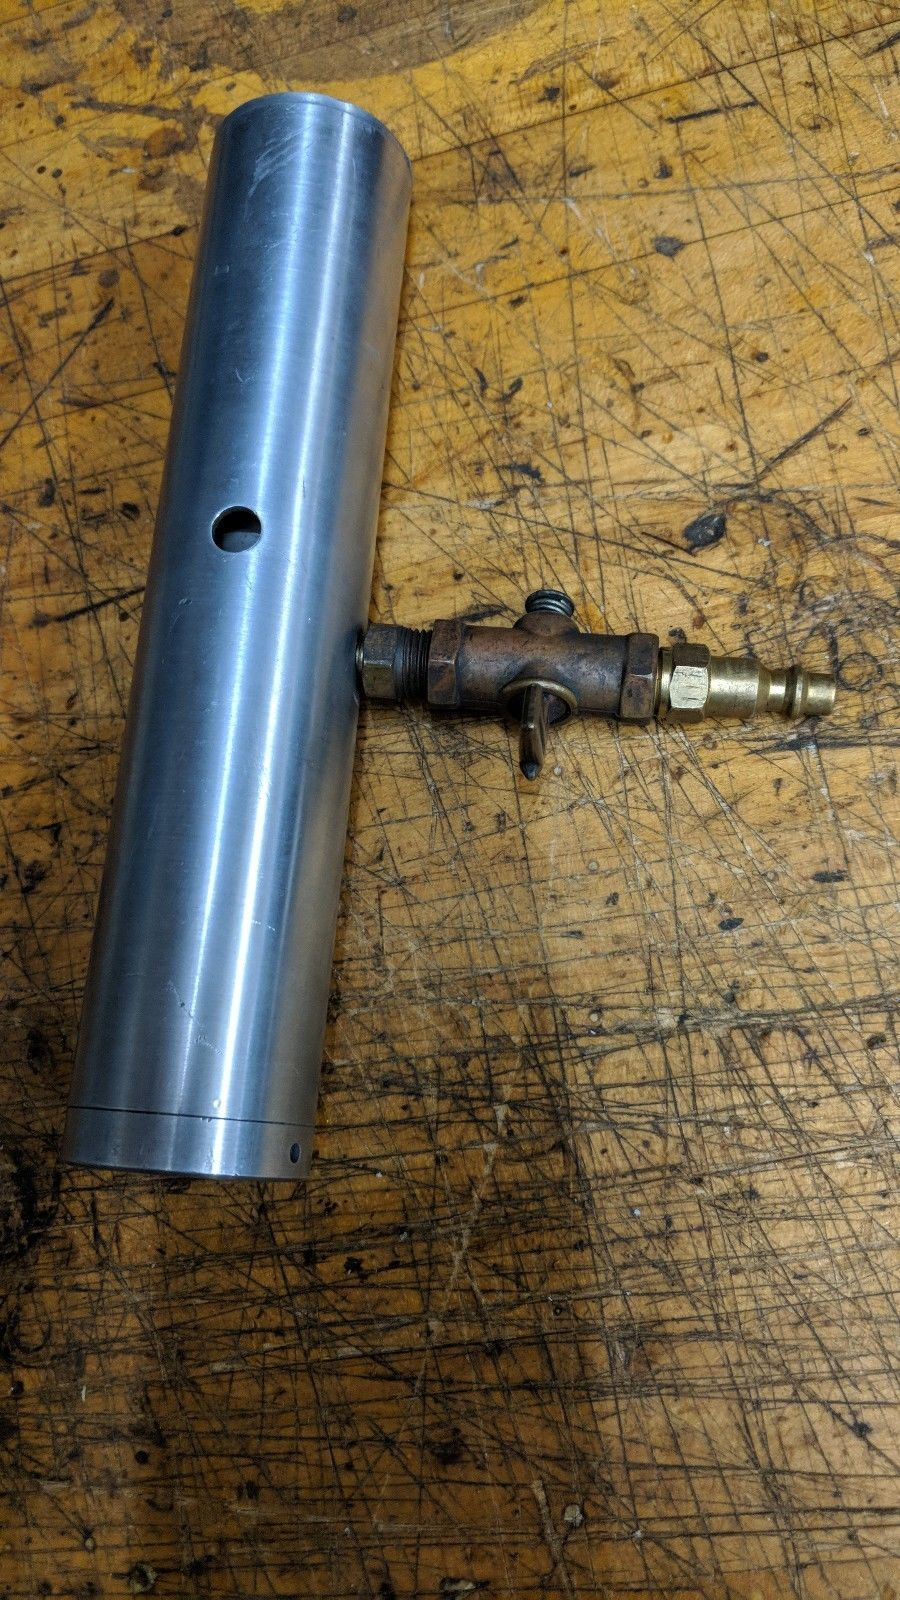 Vortex Tube Cool Cold Air Gun machine tool cutter mill bit pneumatic chiller